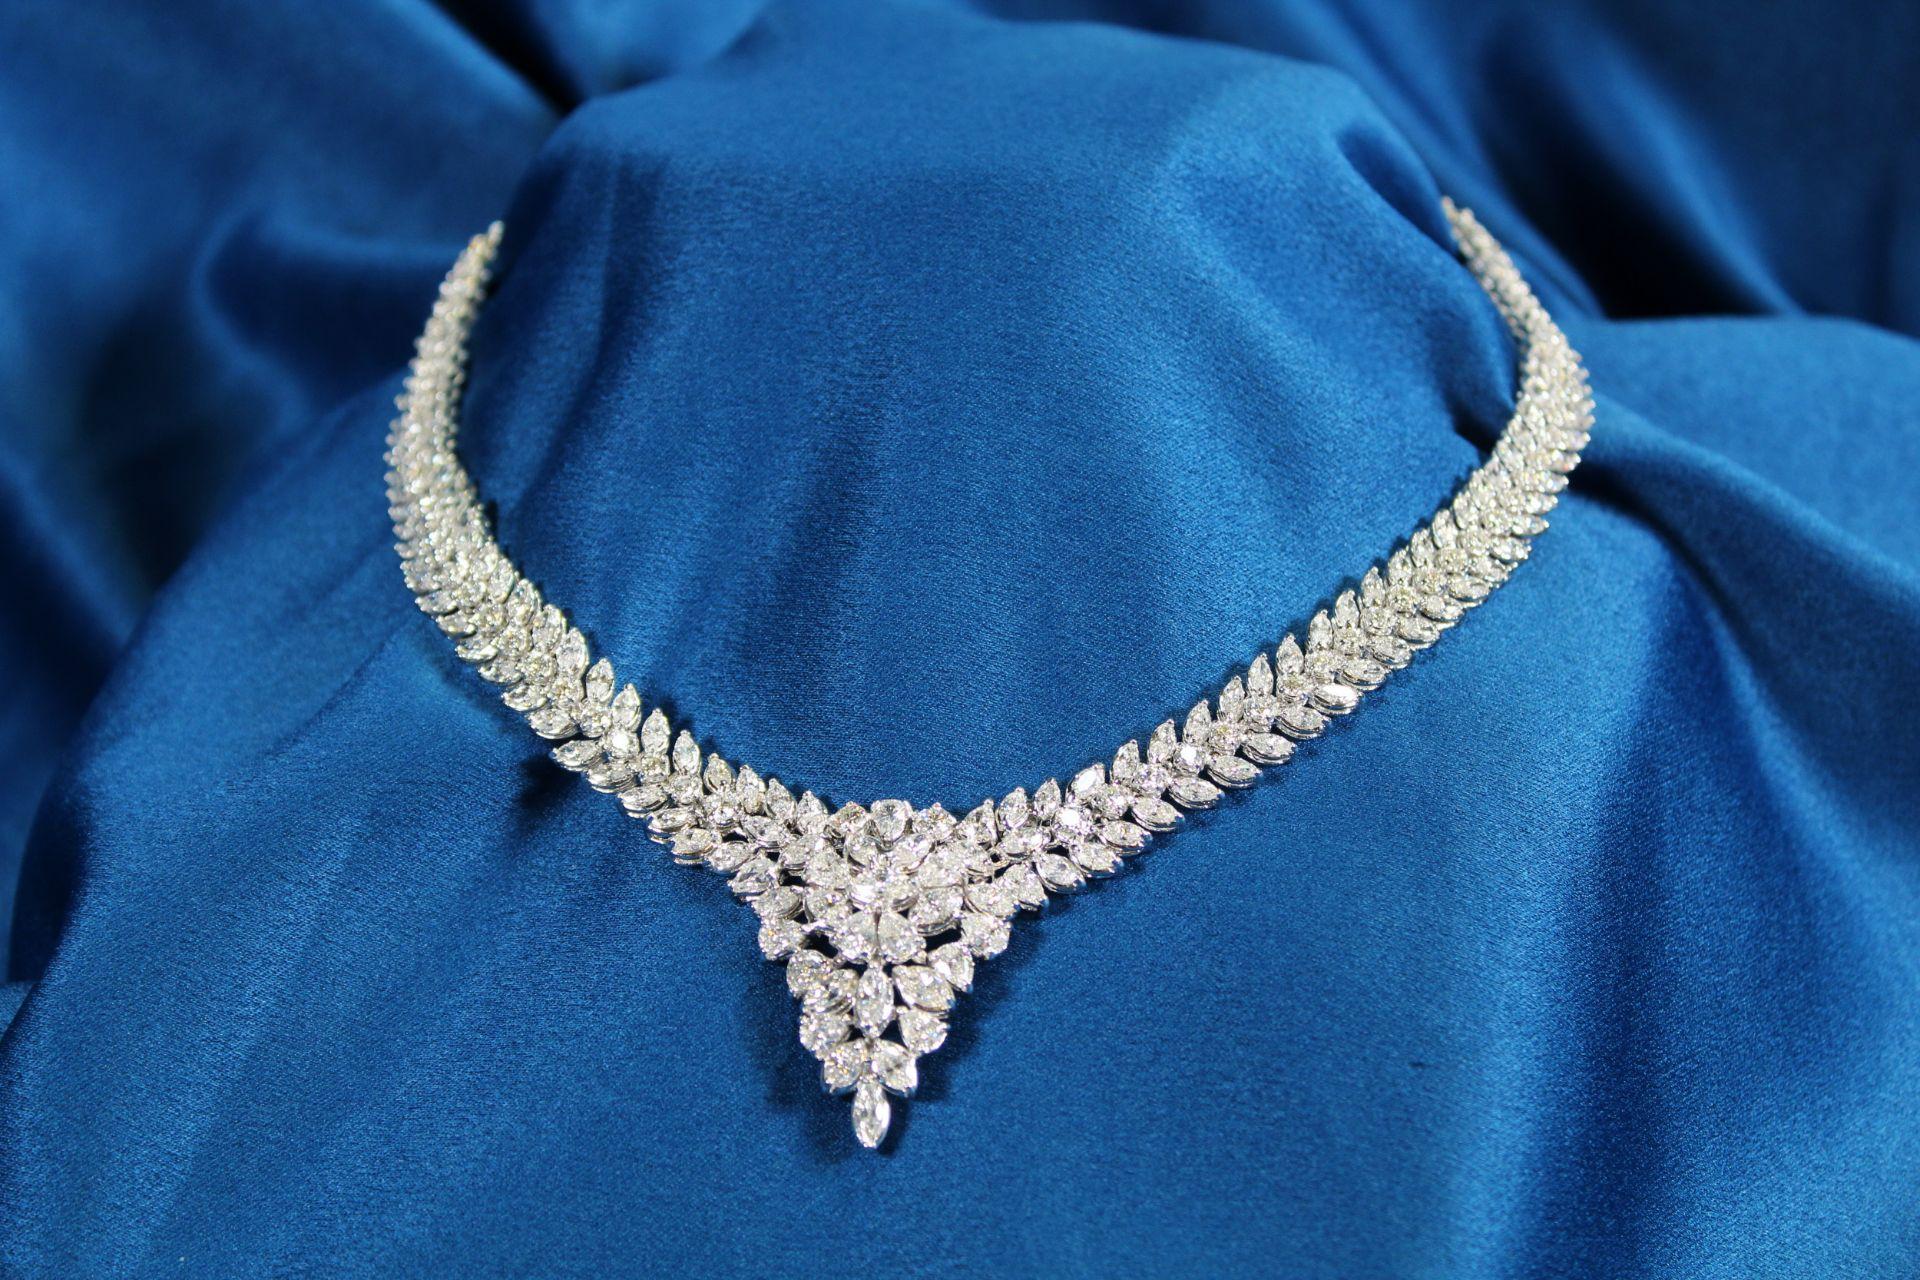 Collier, Atelier J.P. CAM, Fine Jewelery, Hongkong, WG 750, ca. 19.05 ct.